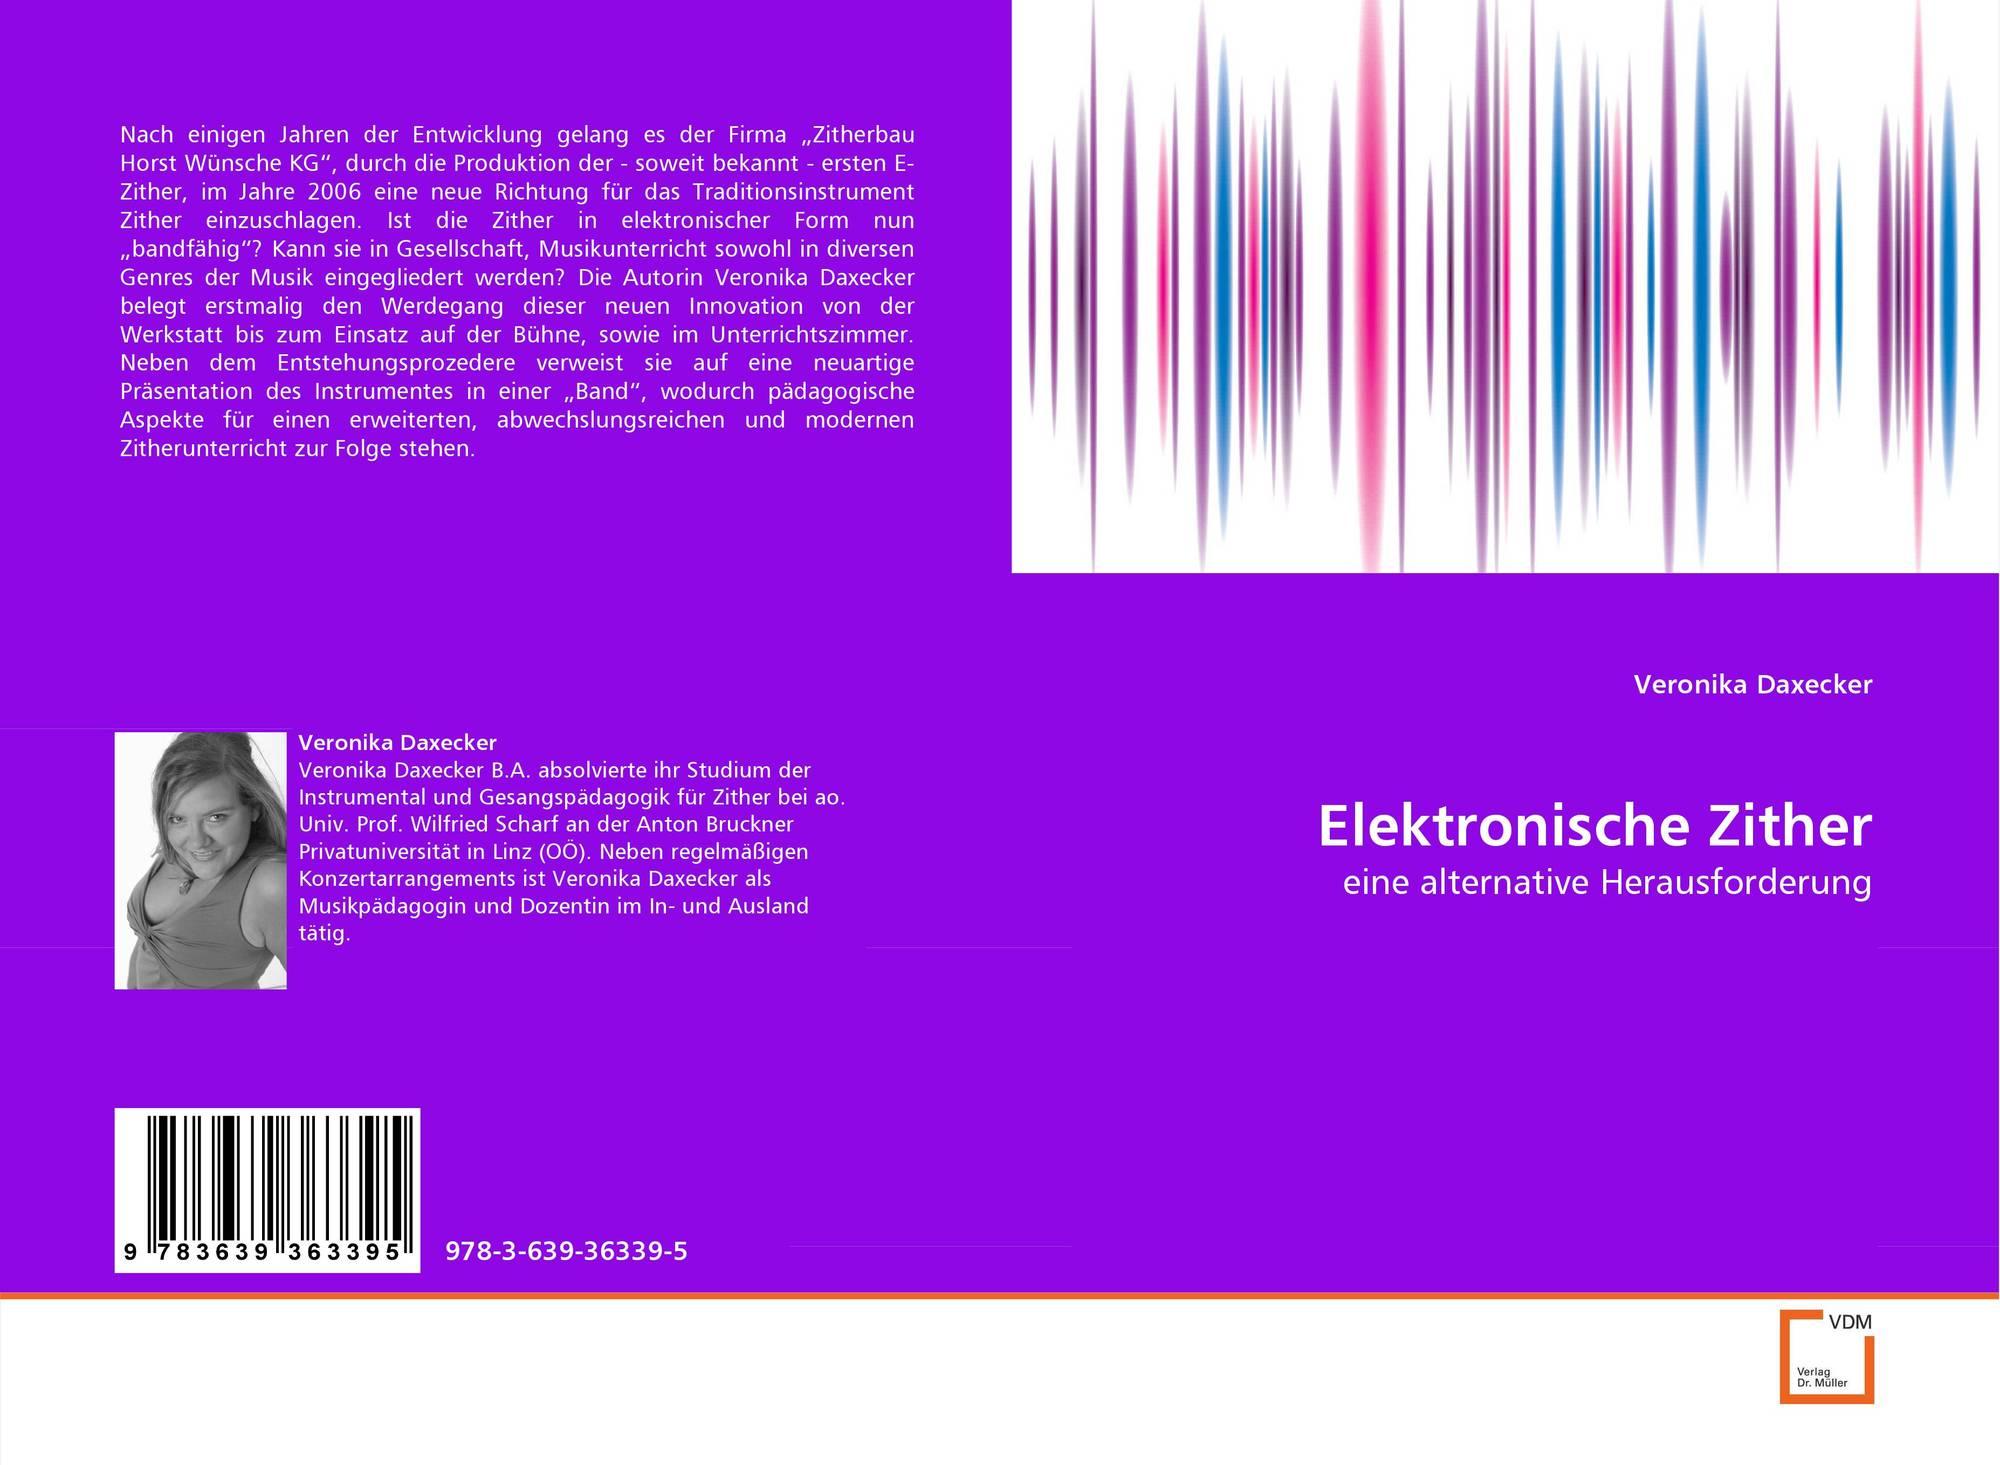 Elektronische Zither